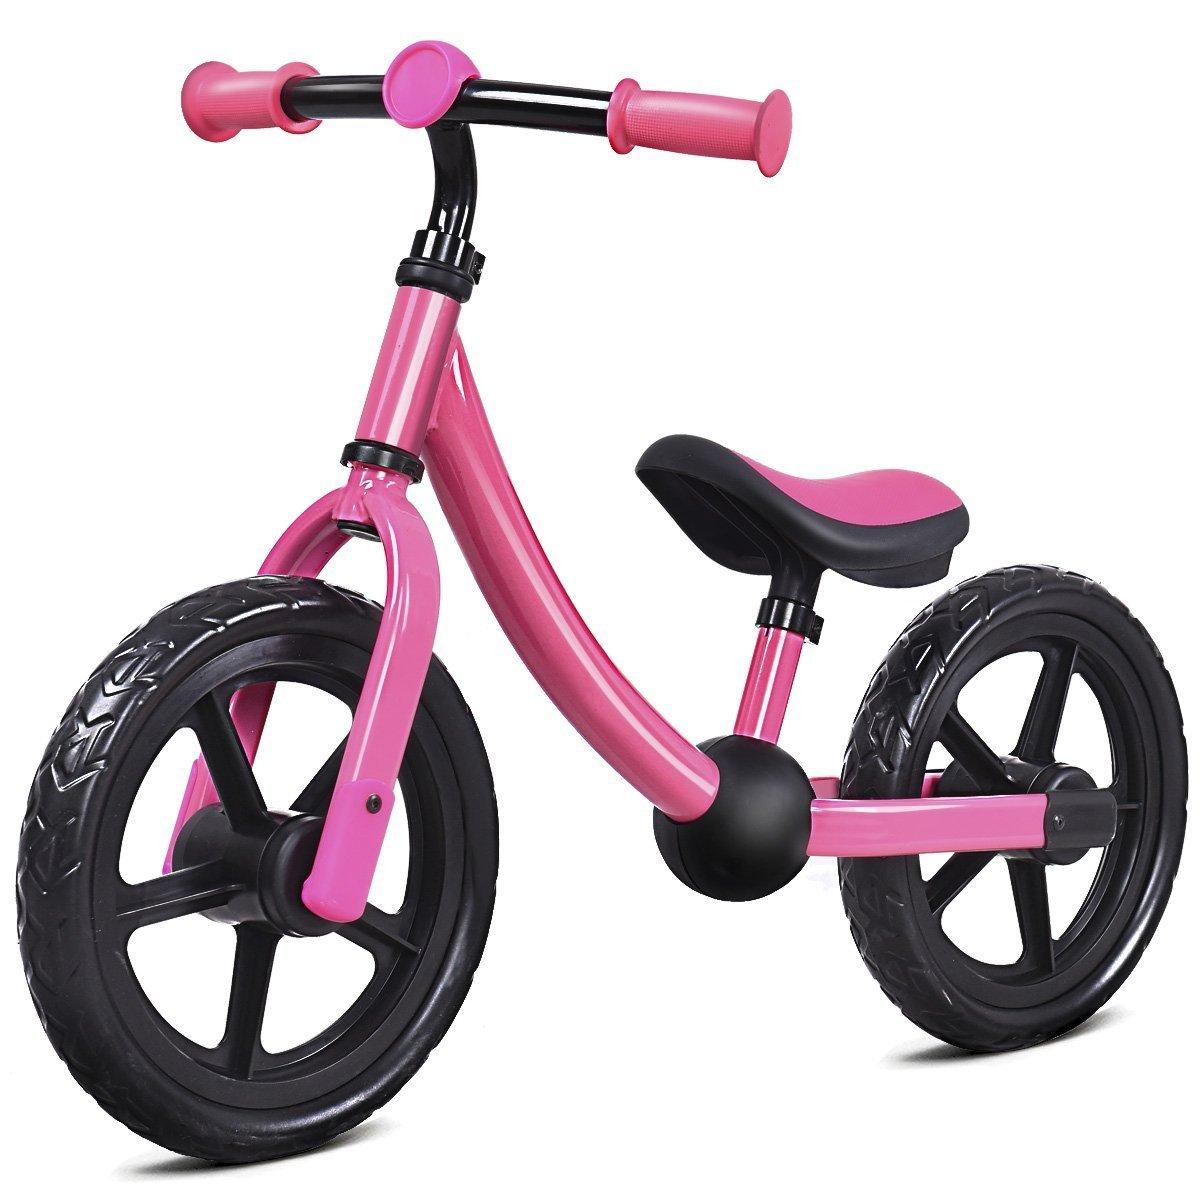 Costzon 12'' Balance Bike, Adjustable Handlebar and Seat, No Pedal Walking Bicycle for Kids (Pink, 1-3 Years Old)